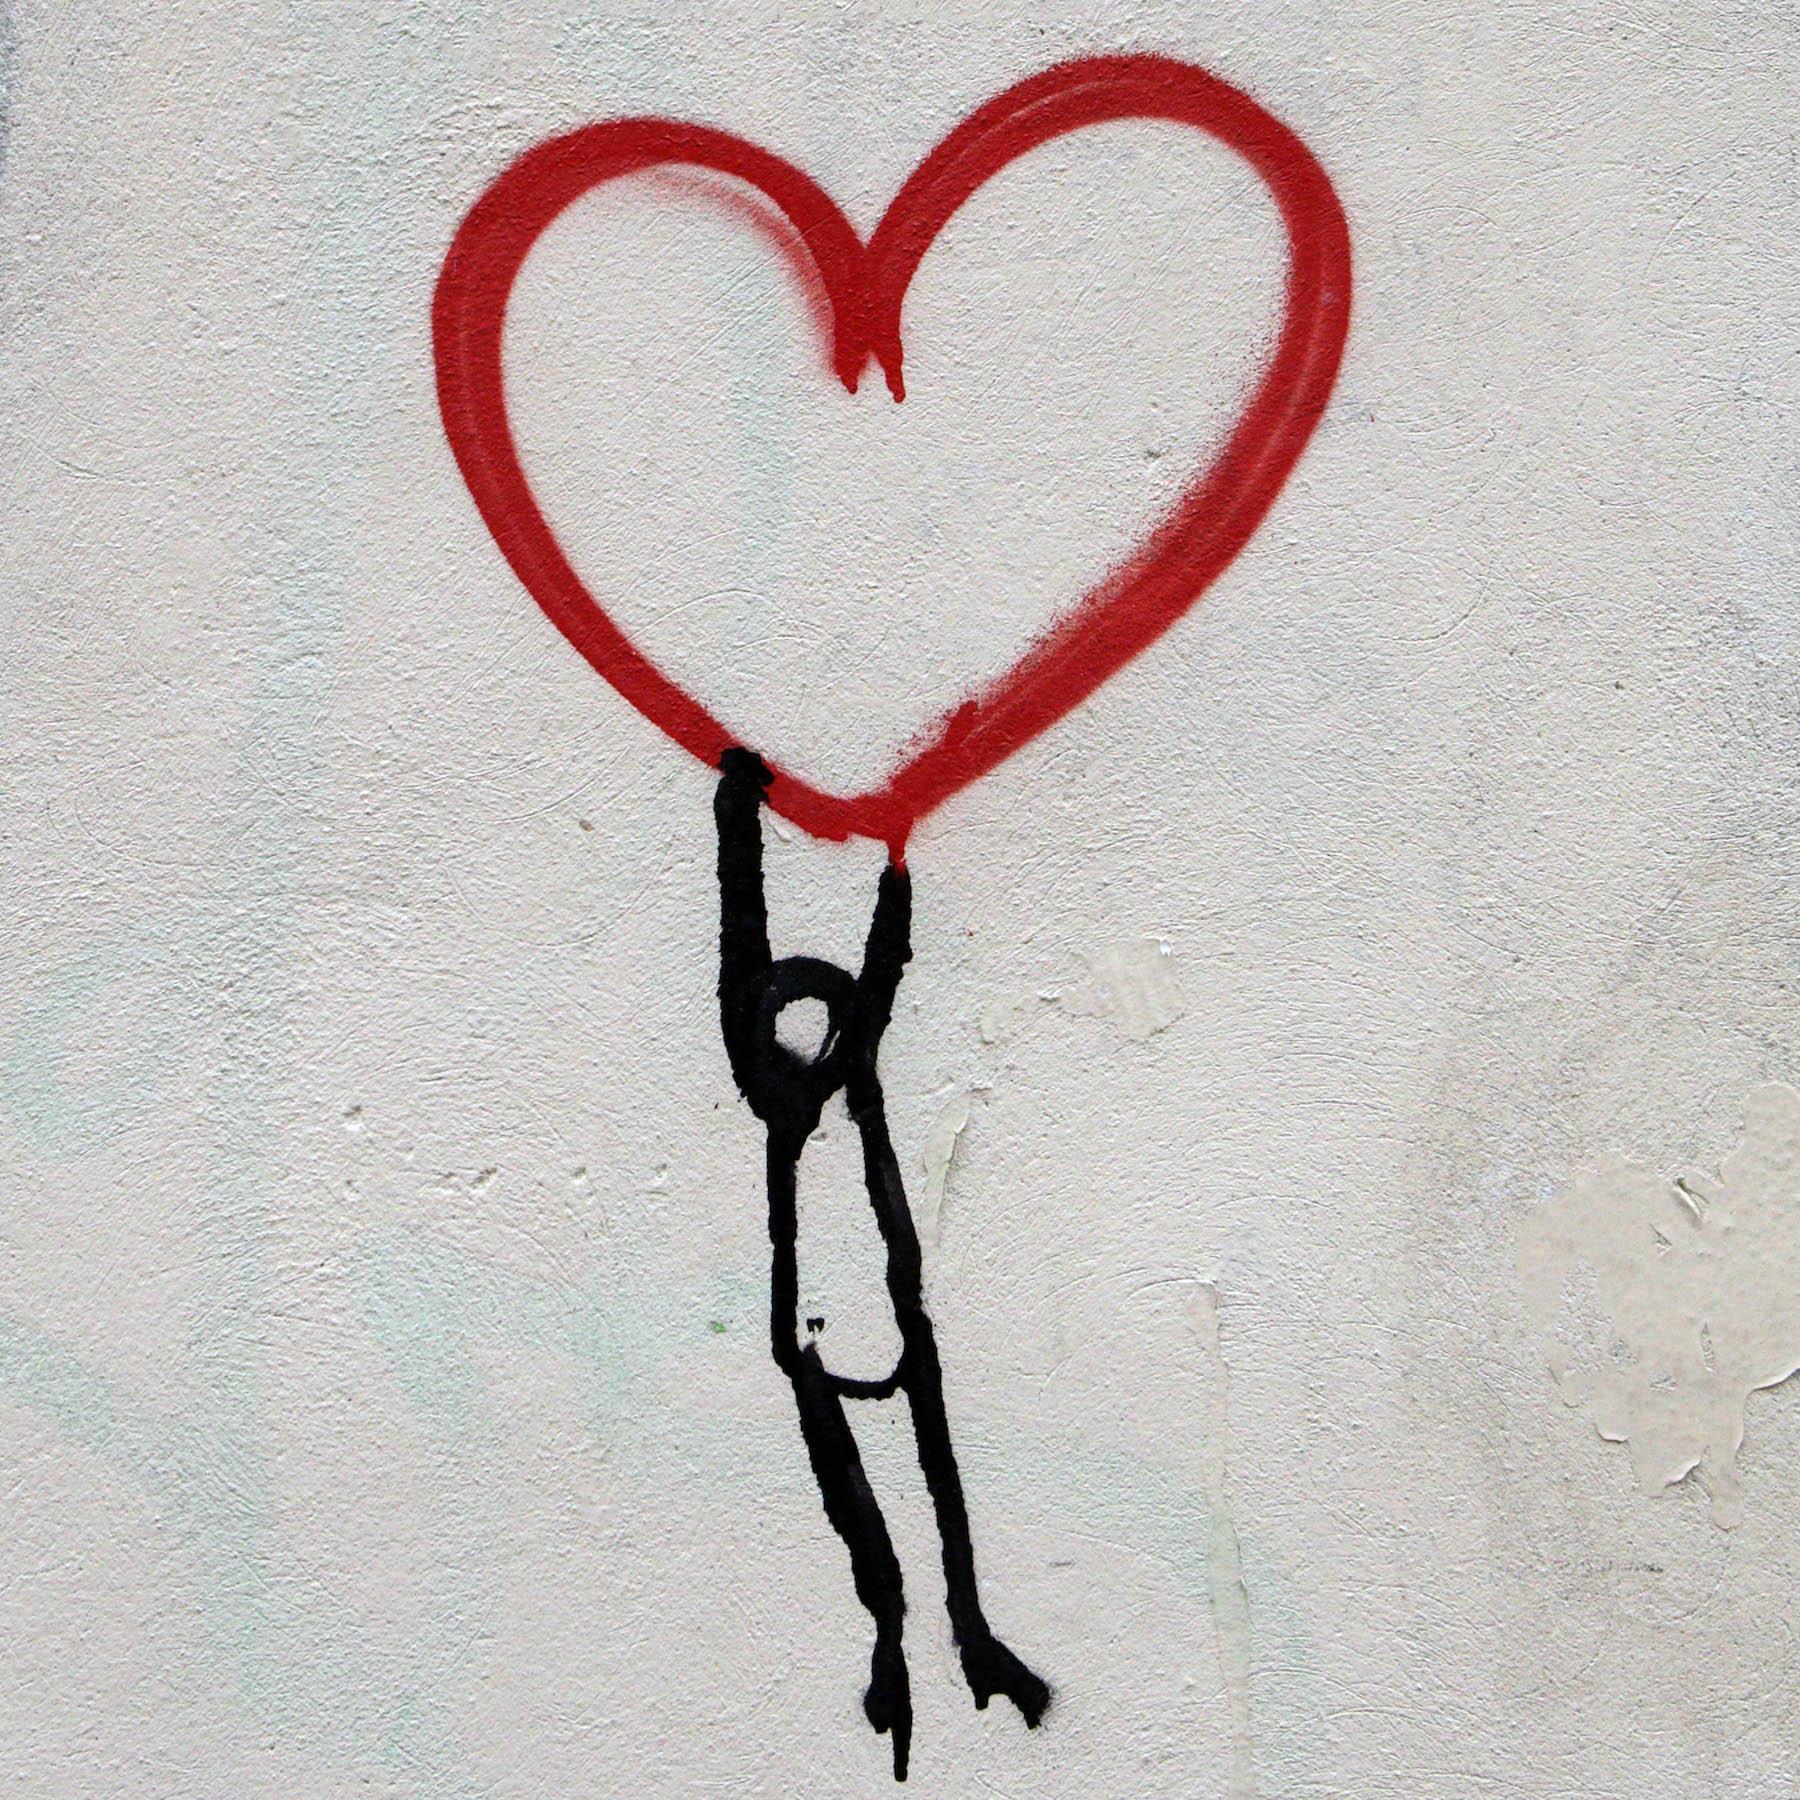 Valentinstag suelovesnyc_valentinstag_kolumne